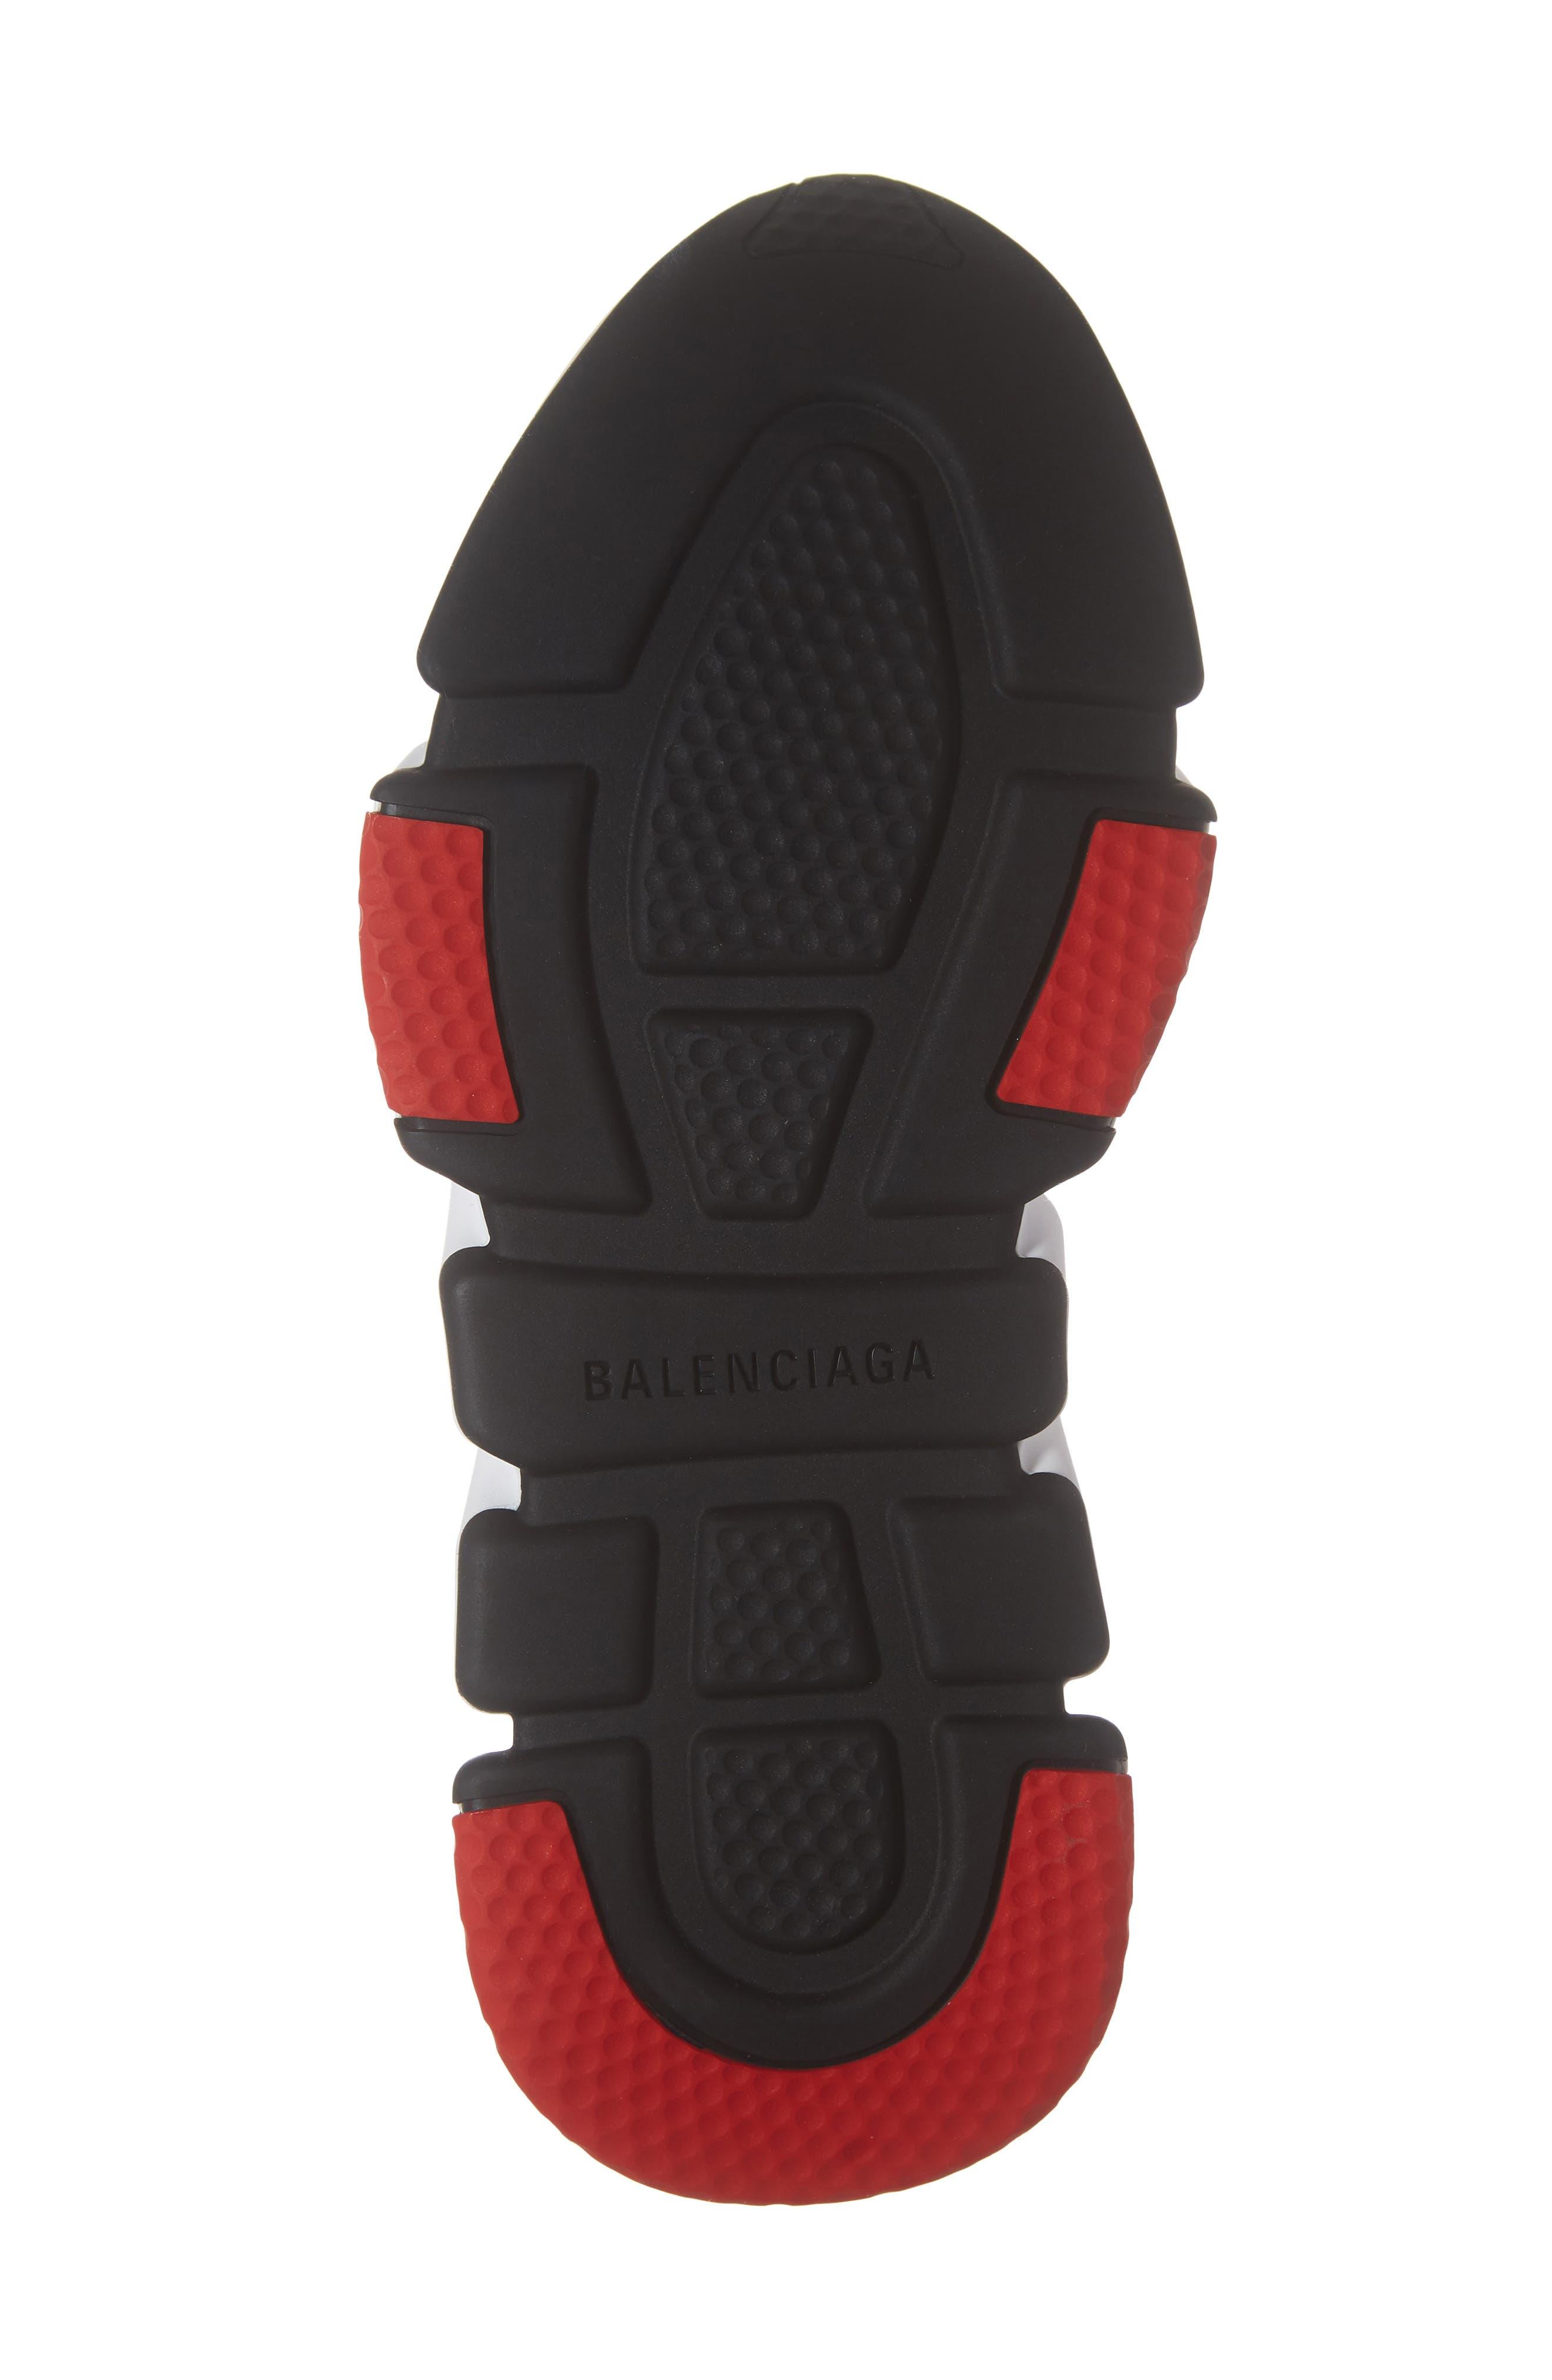 BALENCIAGA, Speed Knit Sneaker, Alternate thumbnail 6, color, BLACK/ RED